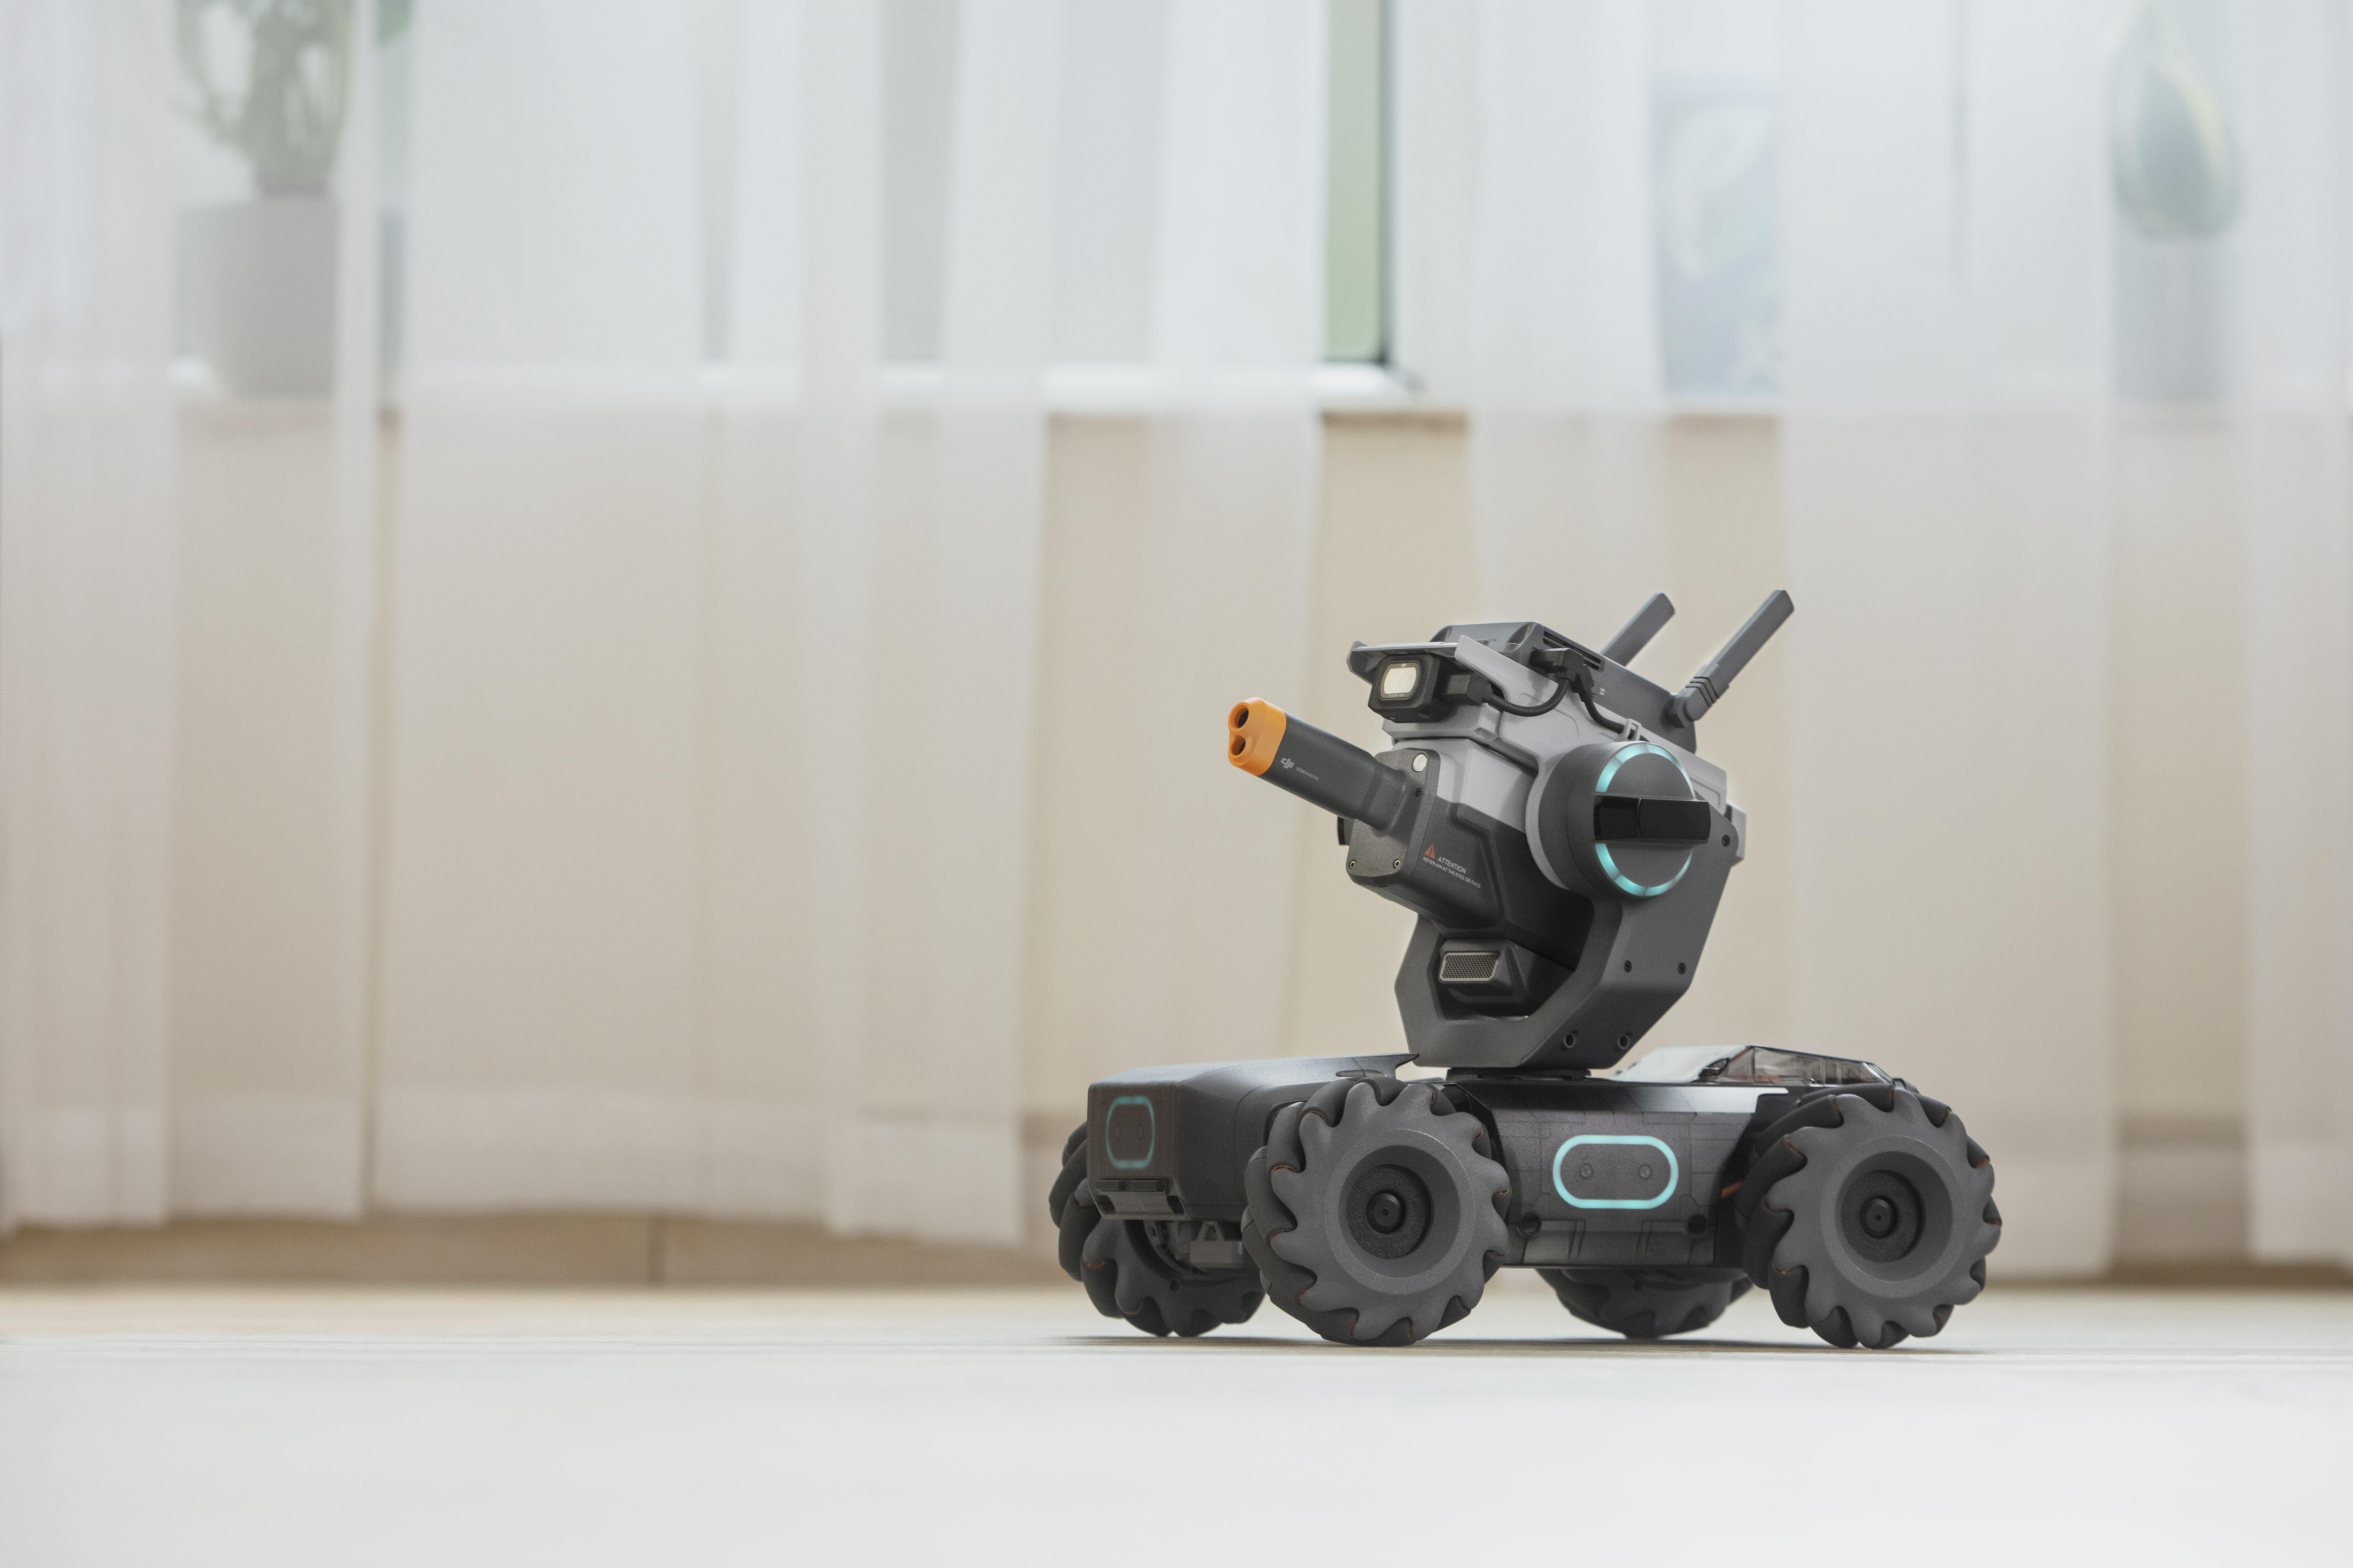 DJI gets into the battling robot business | TechCrunch